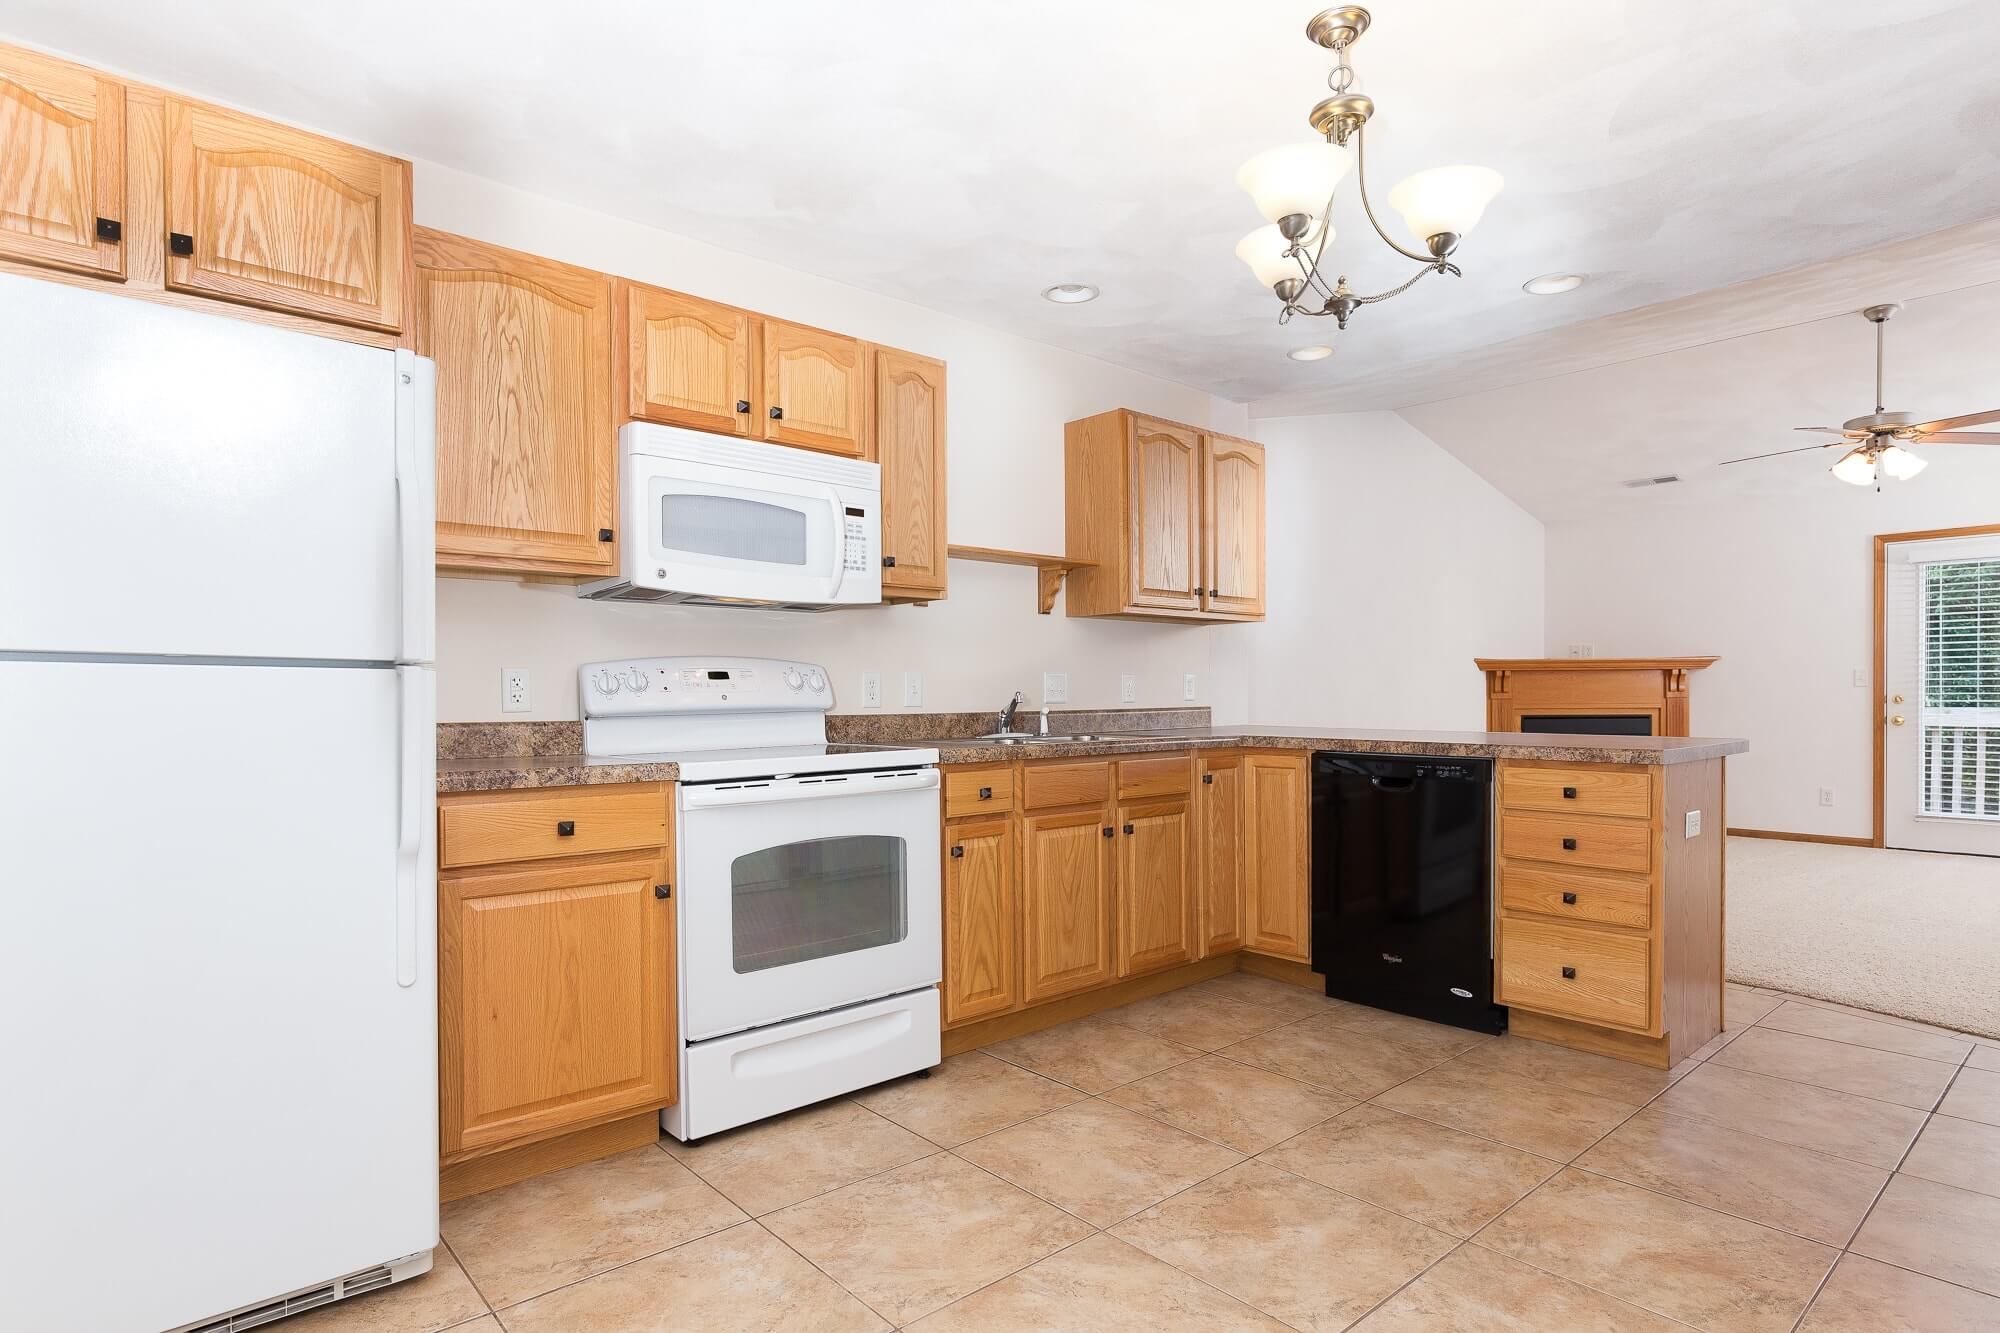 62226 Apartments